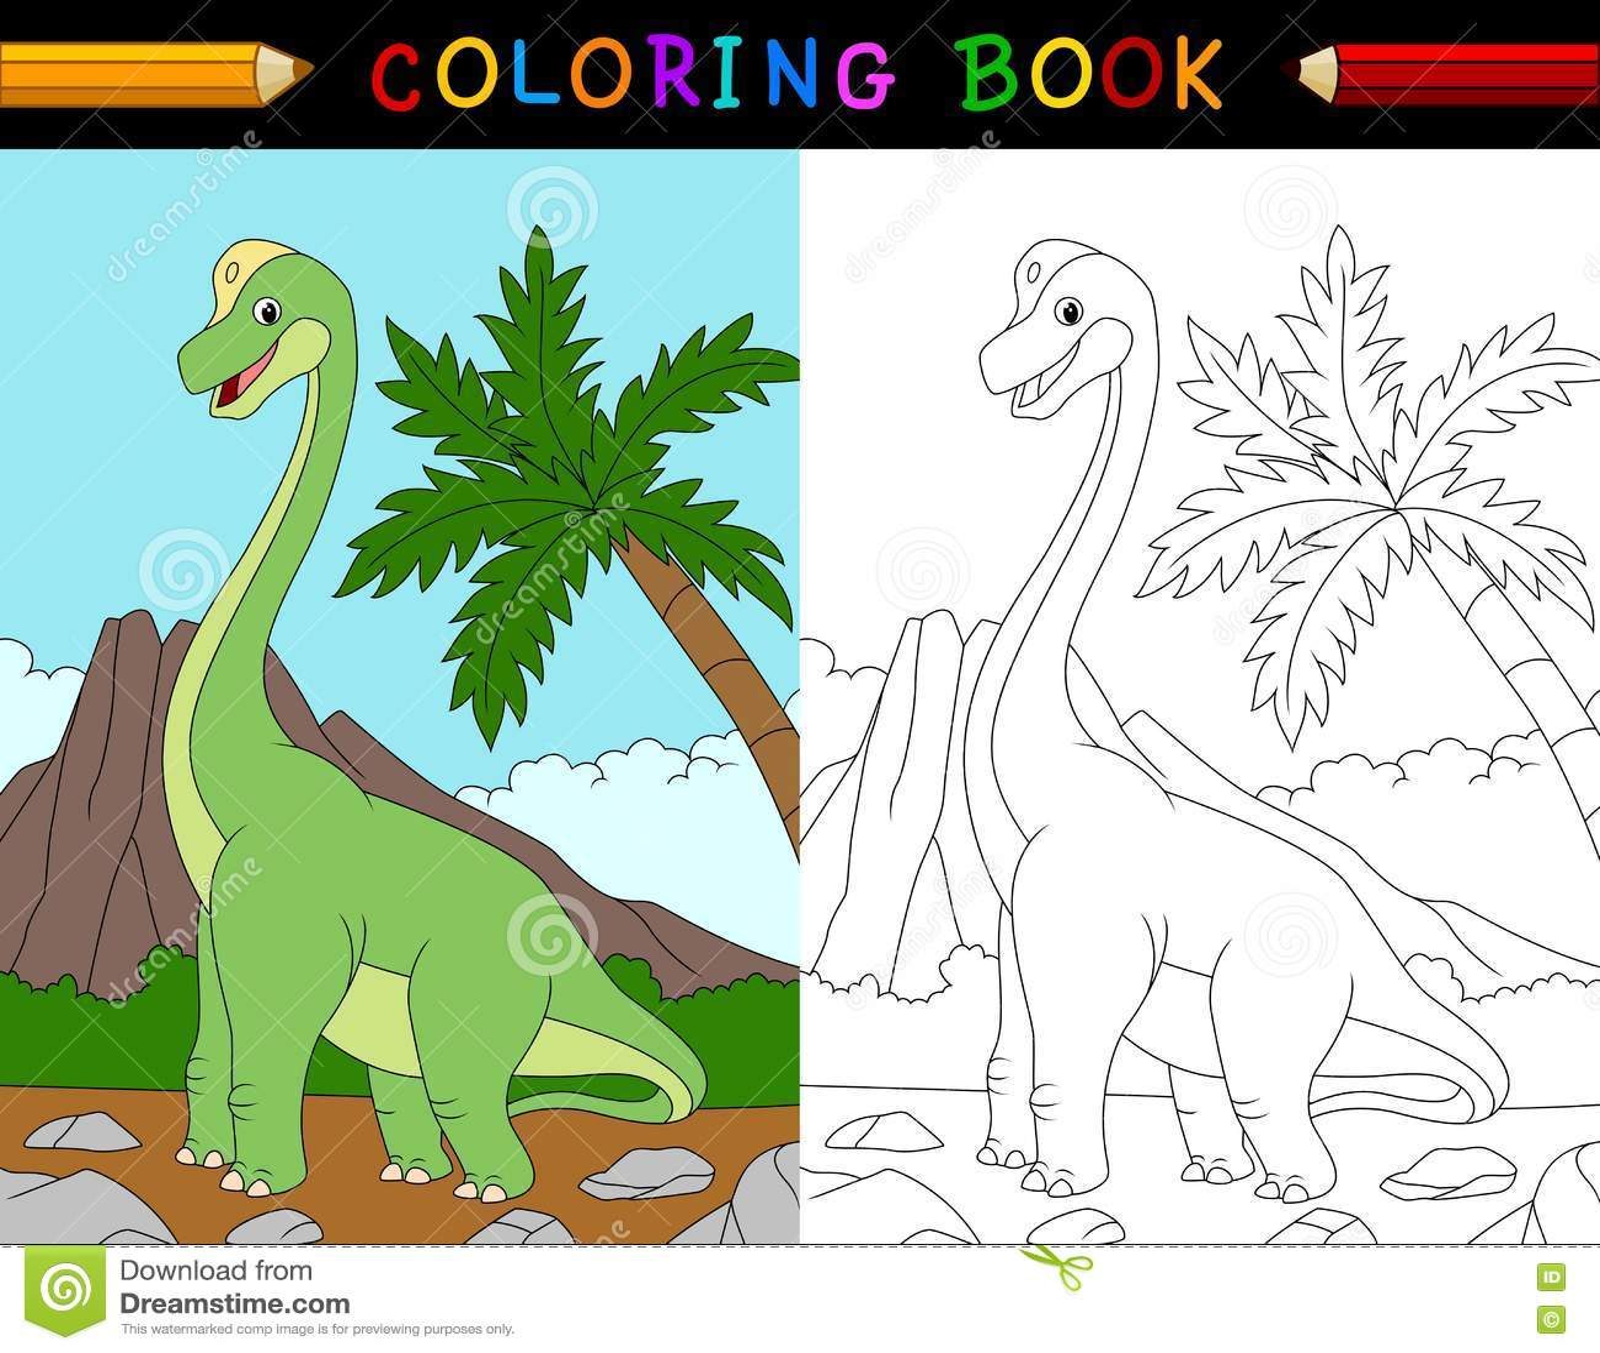 Cartoon Brachiosaurus Coloring Book Stock Vector - Illustration of ...